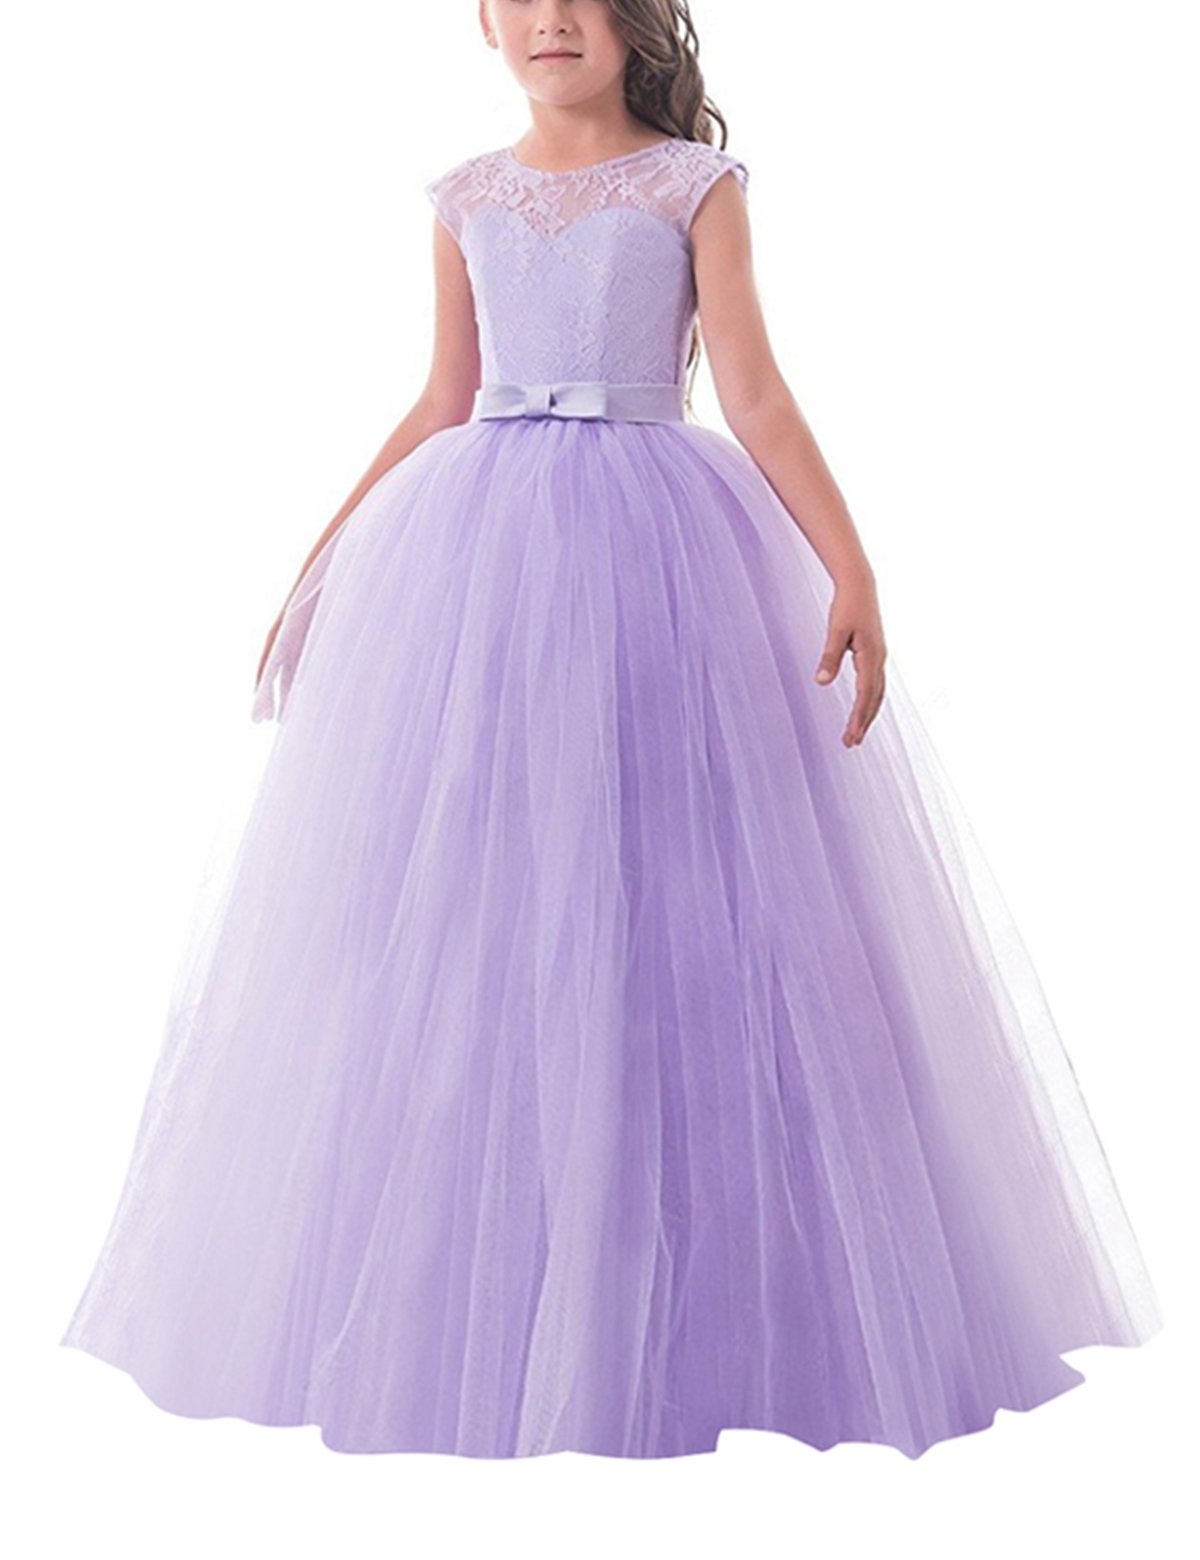 Wedding Dress for Children: Amazon.co.uk